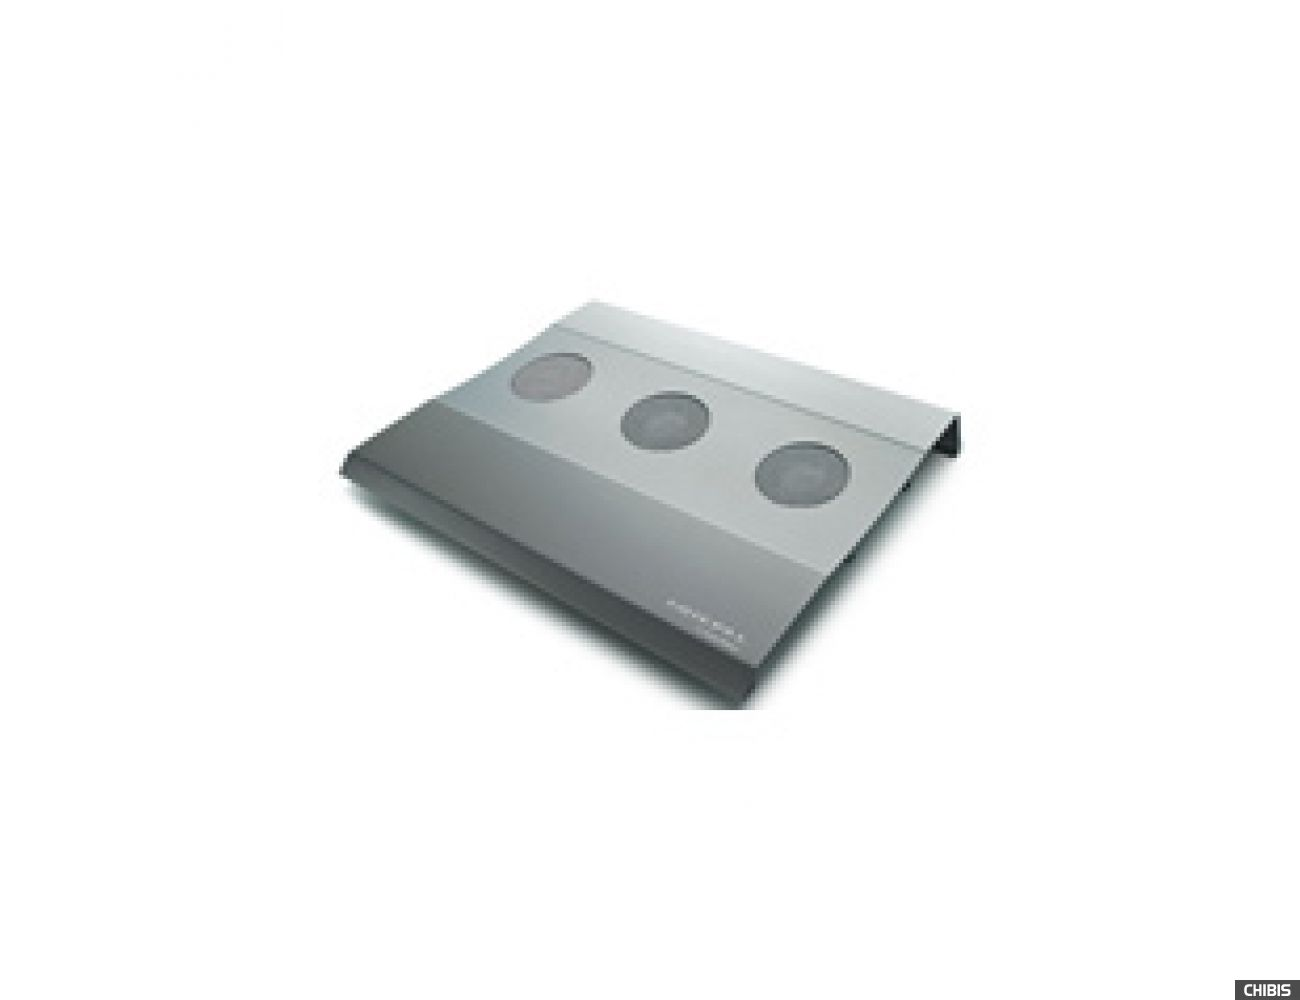 Подставка для ноутбука Cooler Master Notepal W2, алюминиевая, 3x70мм fan, Titan (R9-NBC-AWCT-GP)